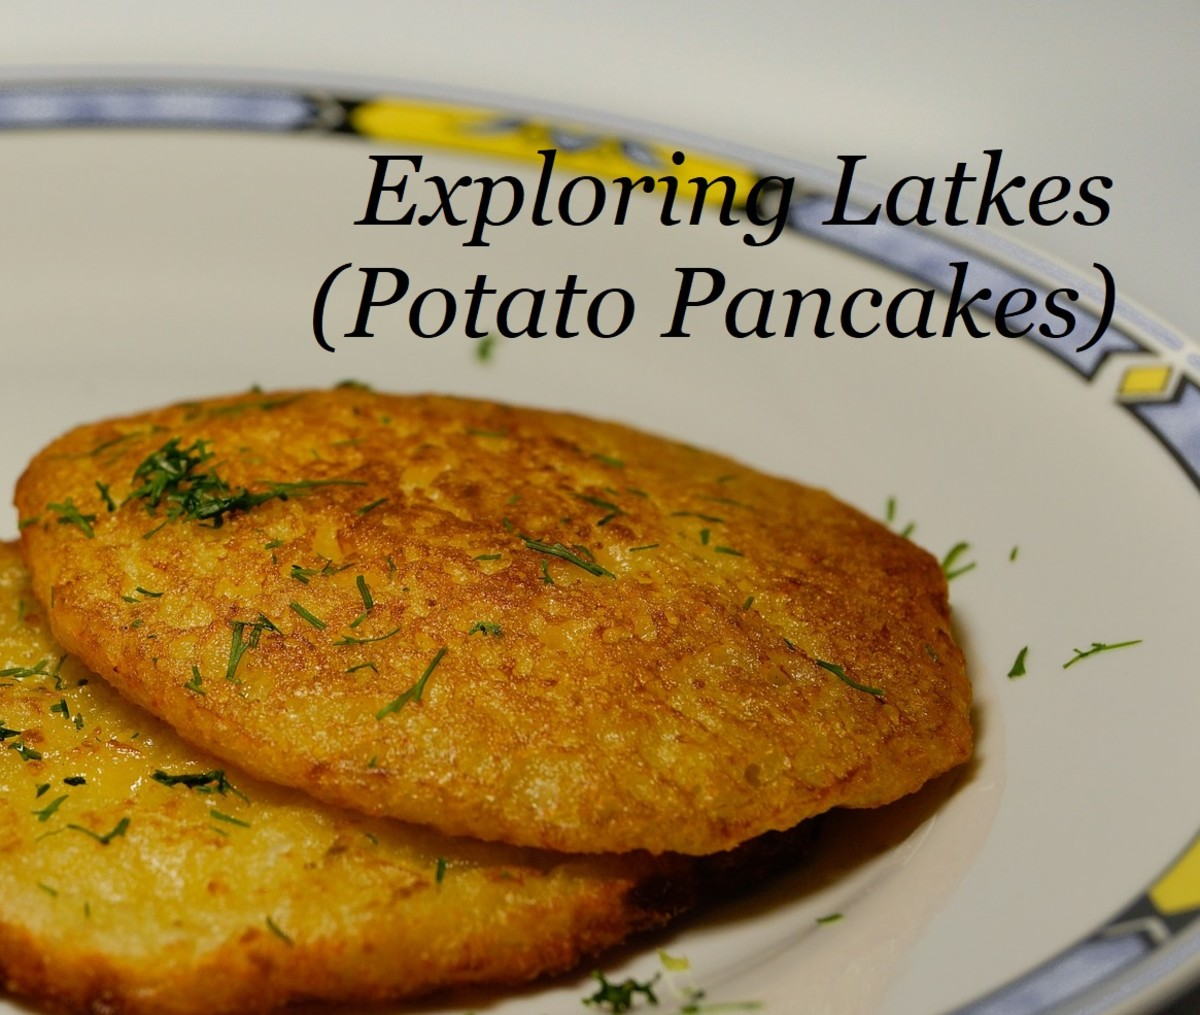 Exploring Latkes (Potato Pancakes)